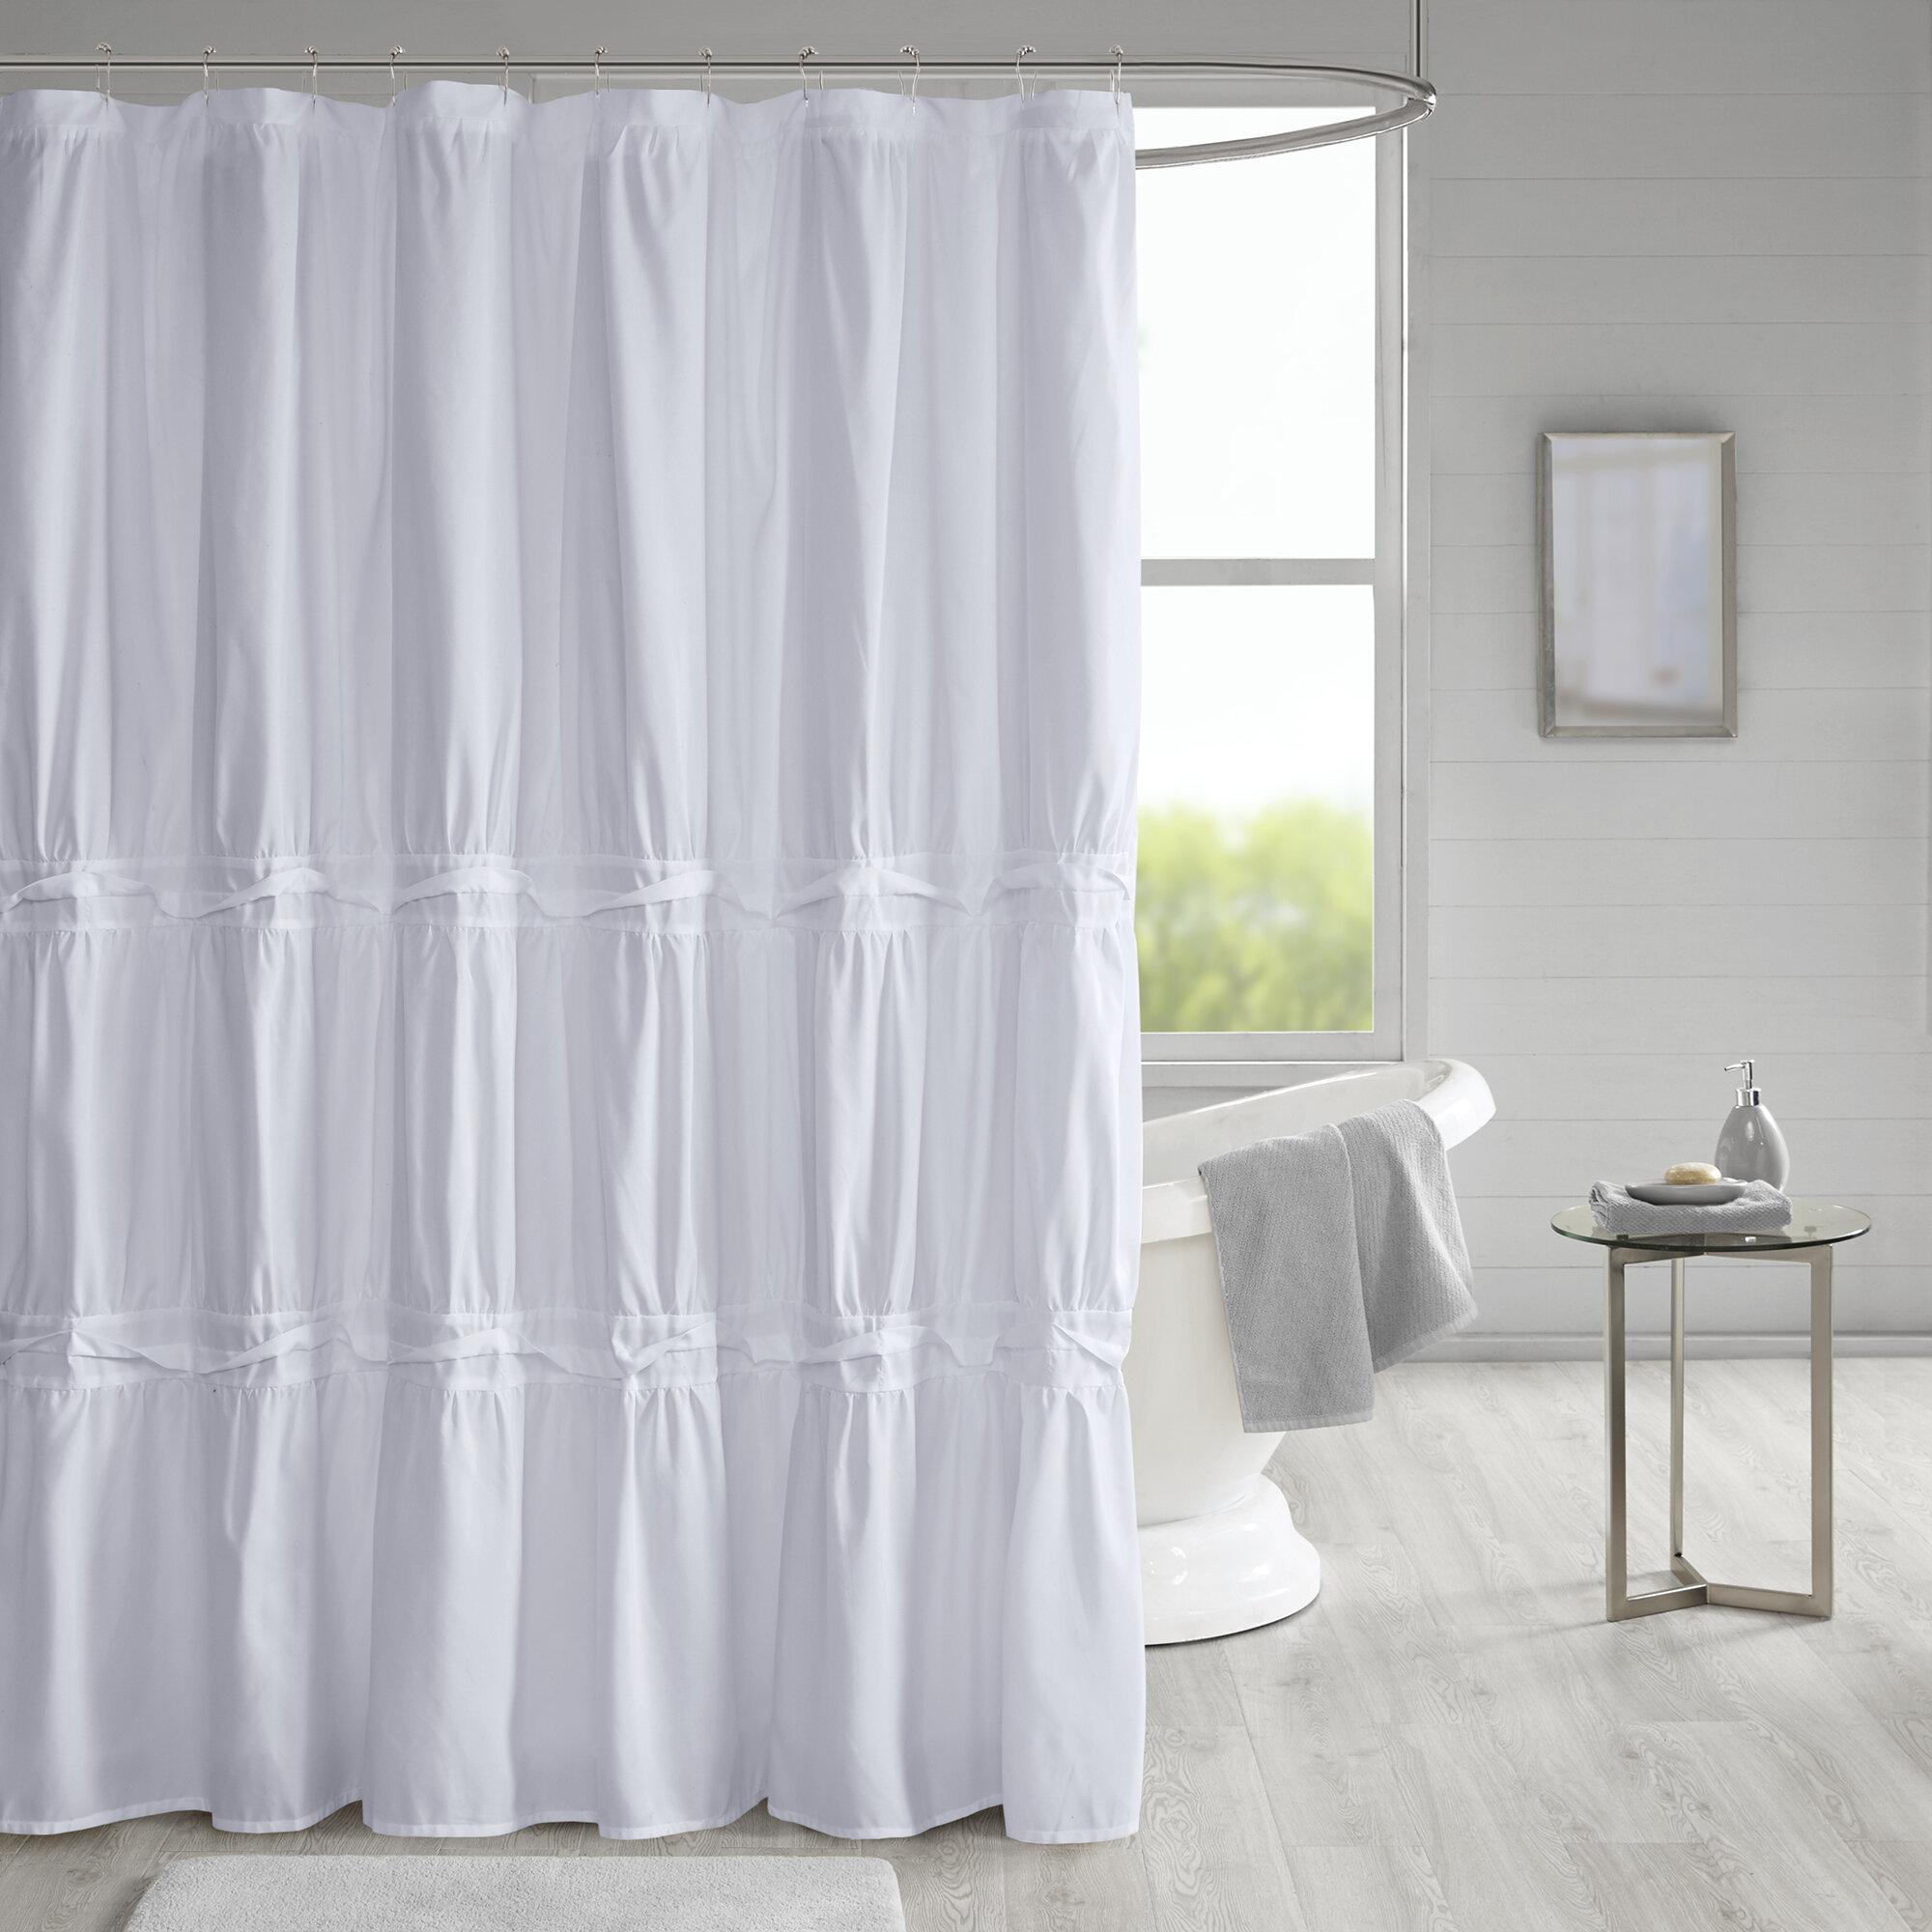 Tyntesfield Solid Single Shower Curtain